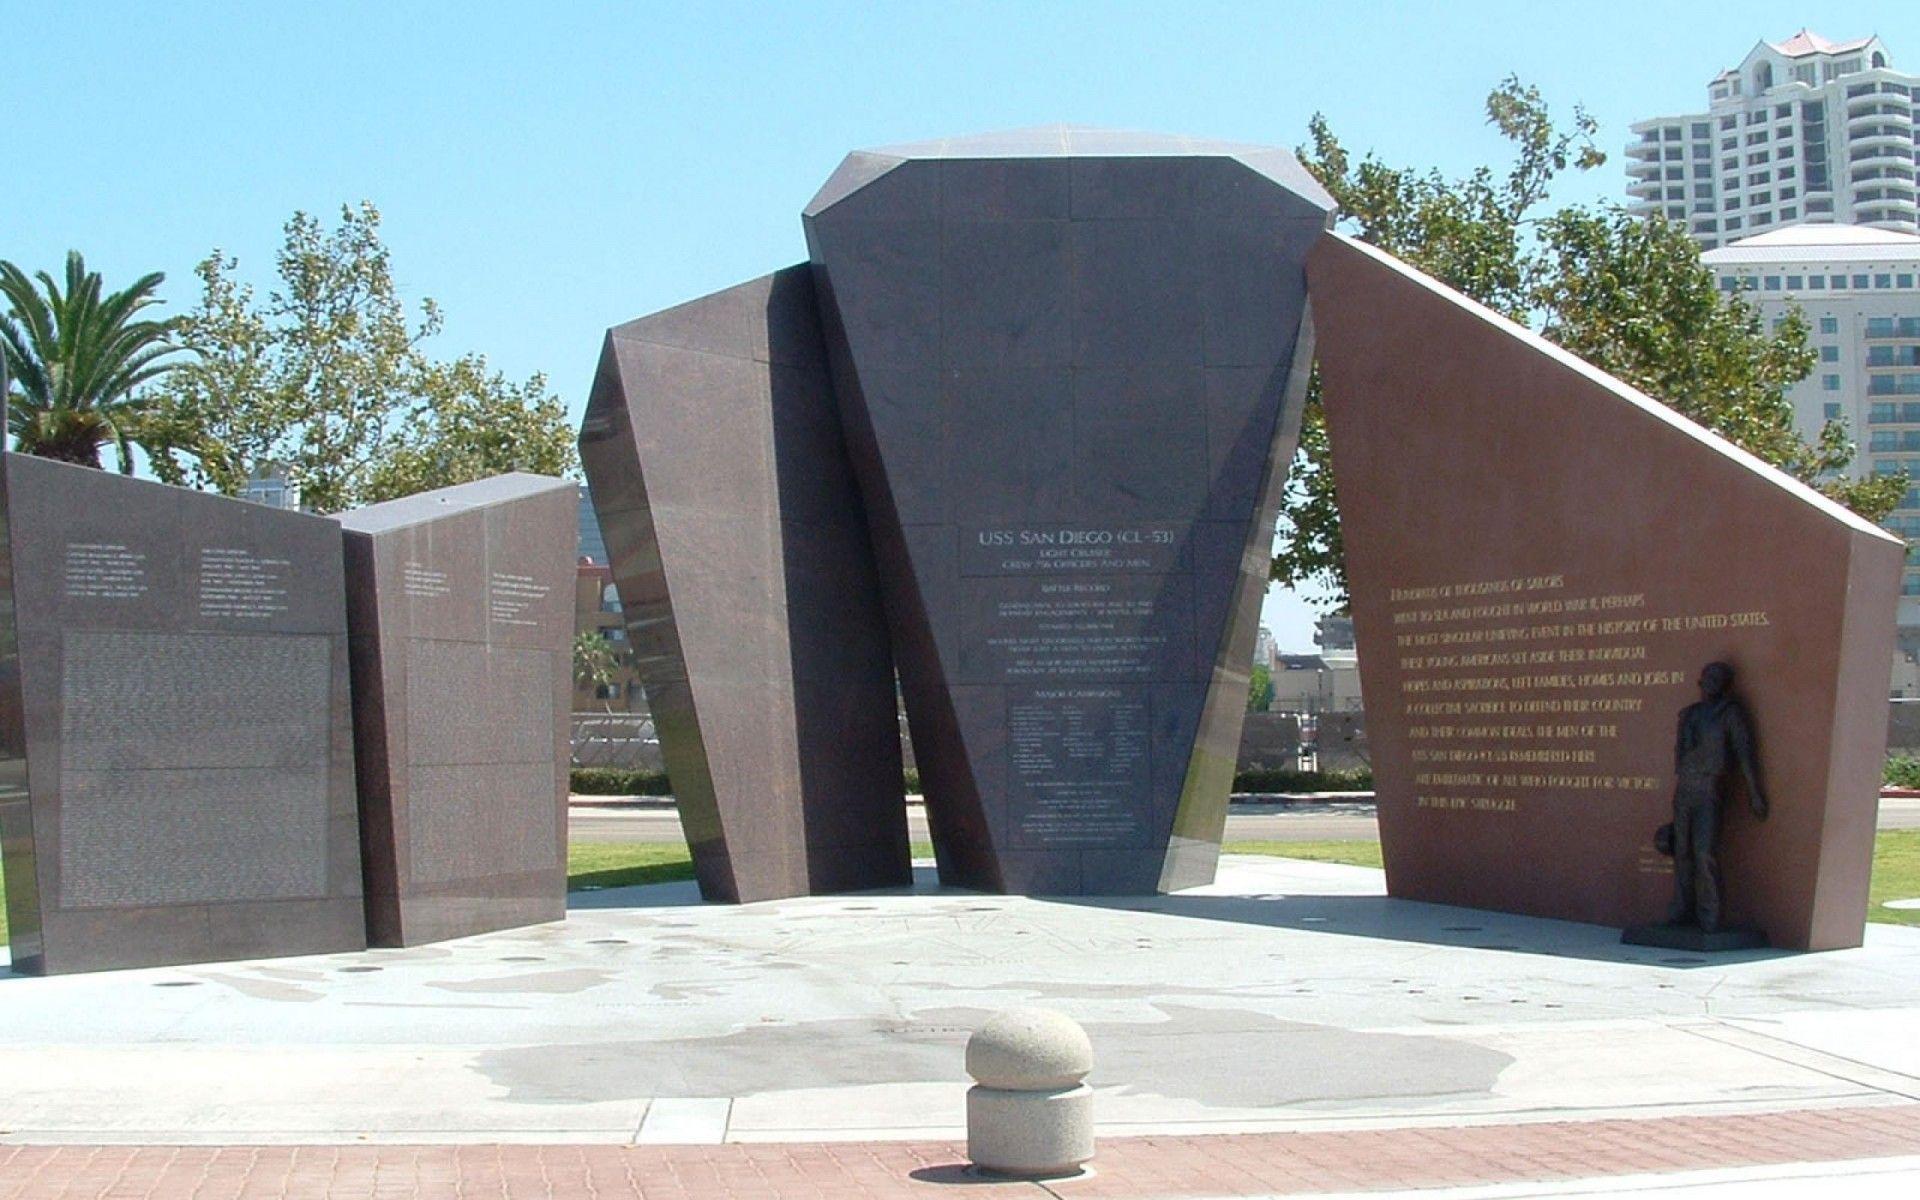 monument seaport village san diego california hd wallpaper san diego california monument village pinterest